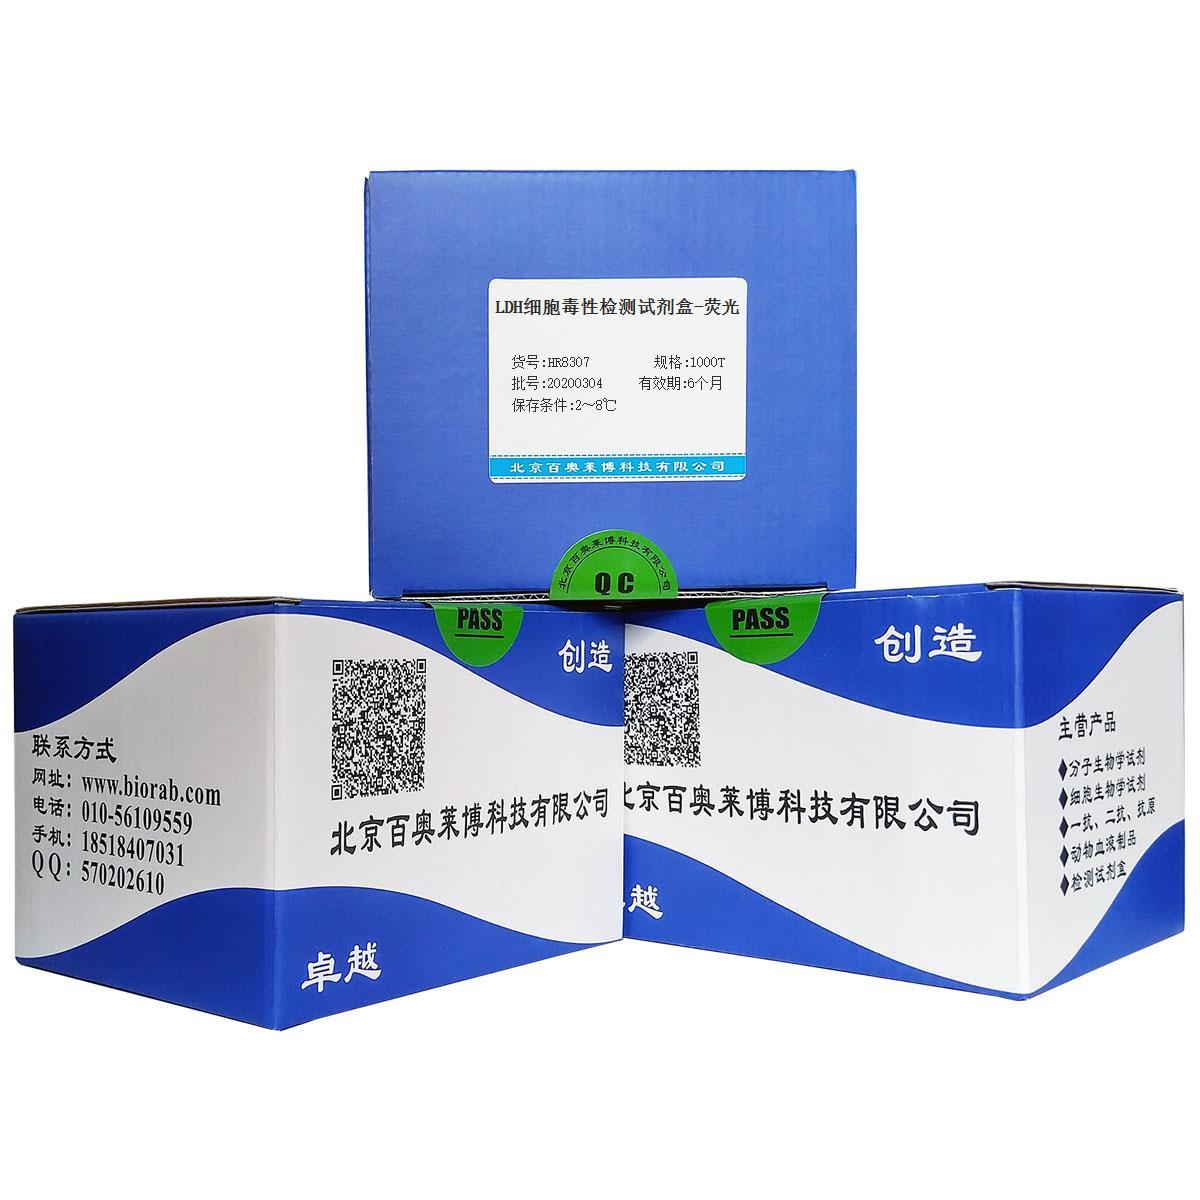 LDH细胞毒性检测试剂盒-荧光北京价格